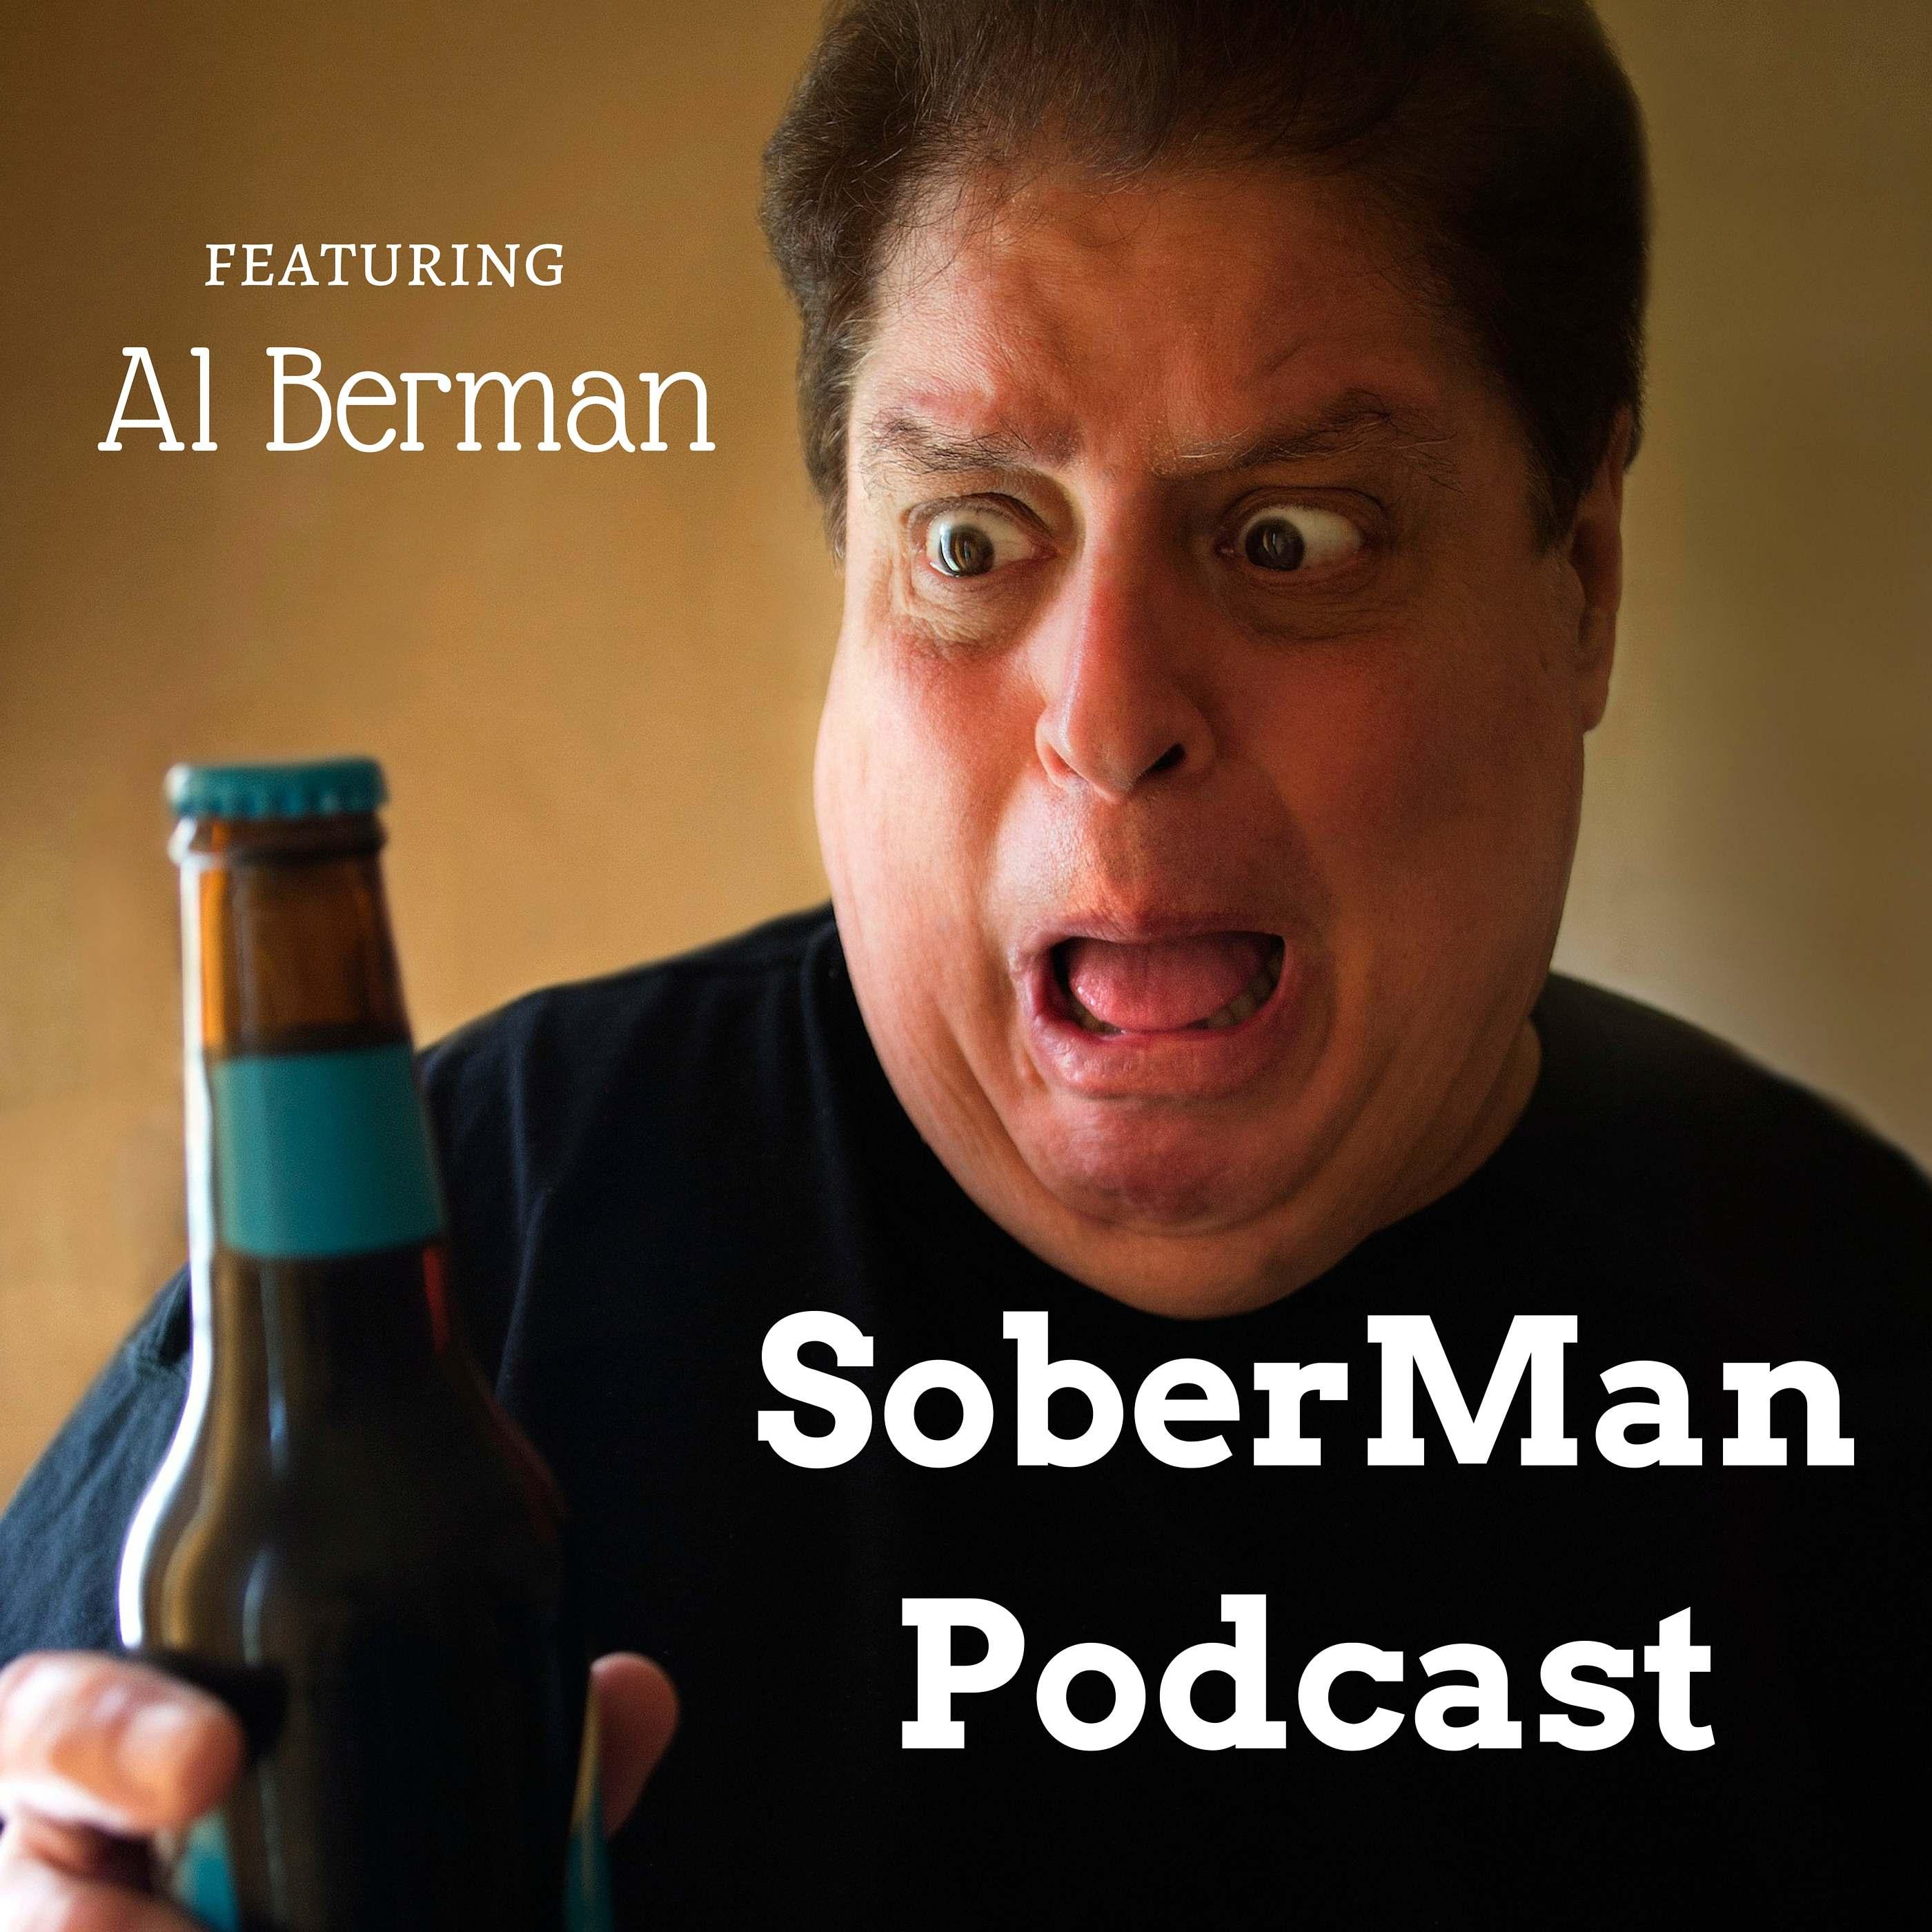 Soberman Podcast | A Comedic Slice of Urban Life show art